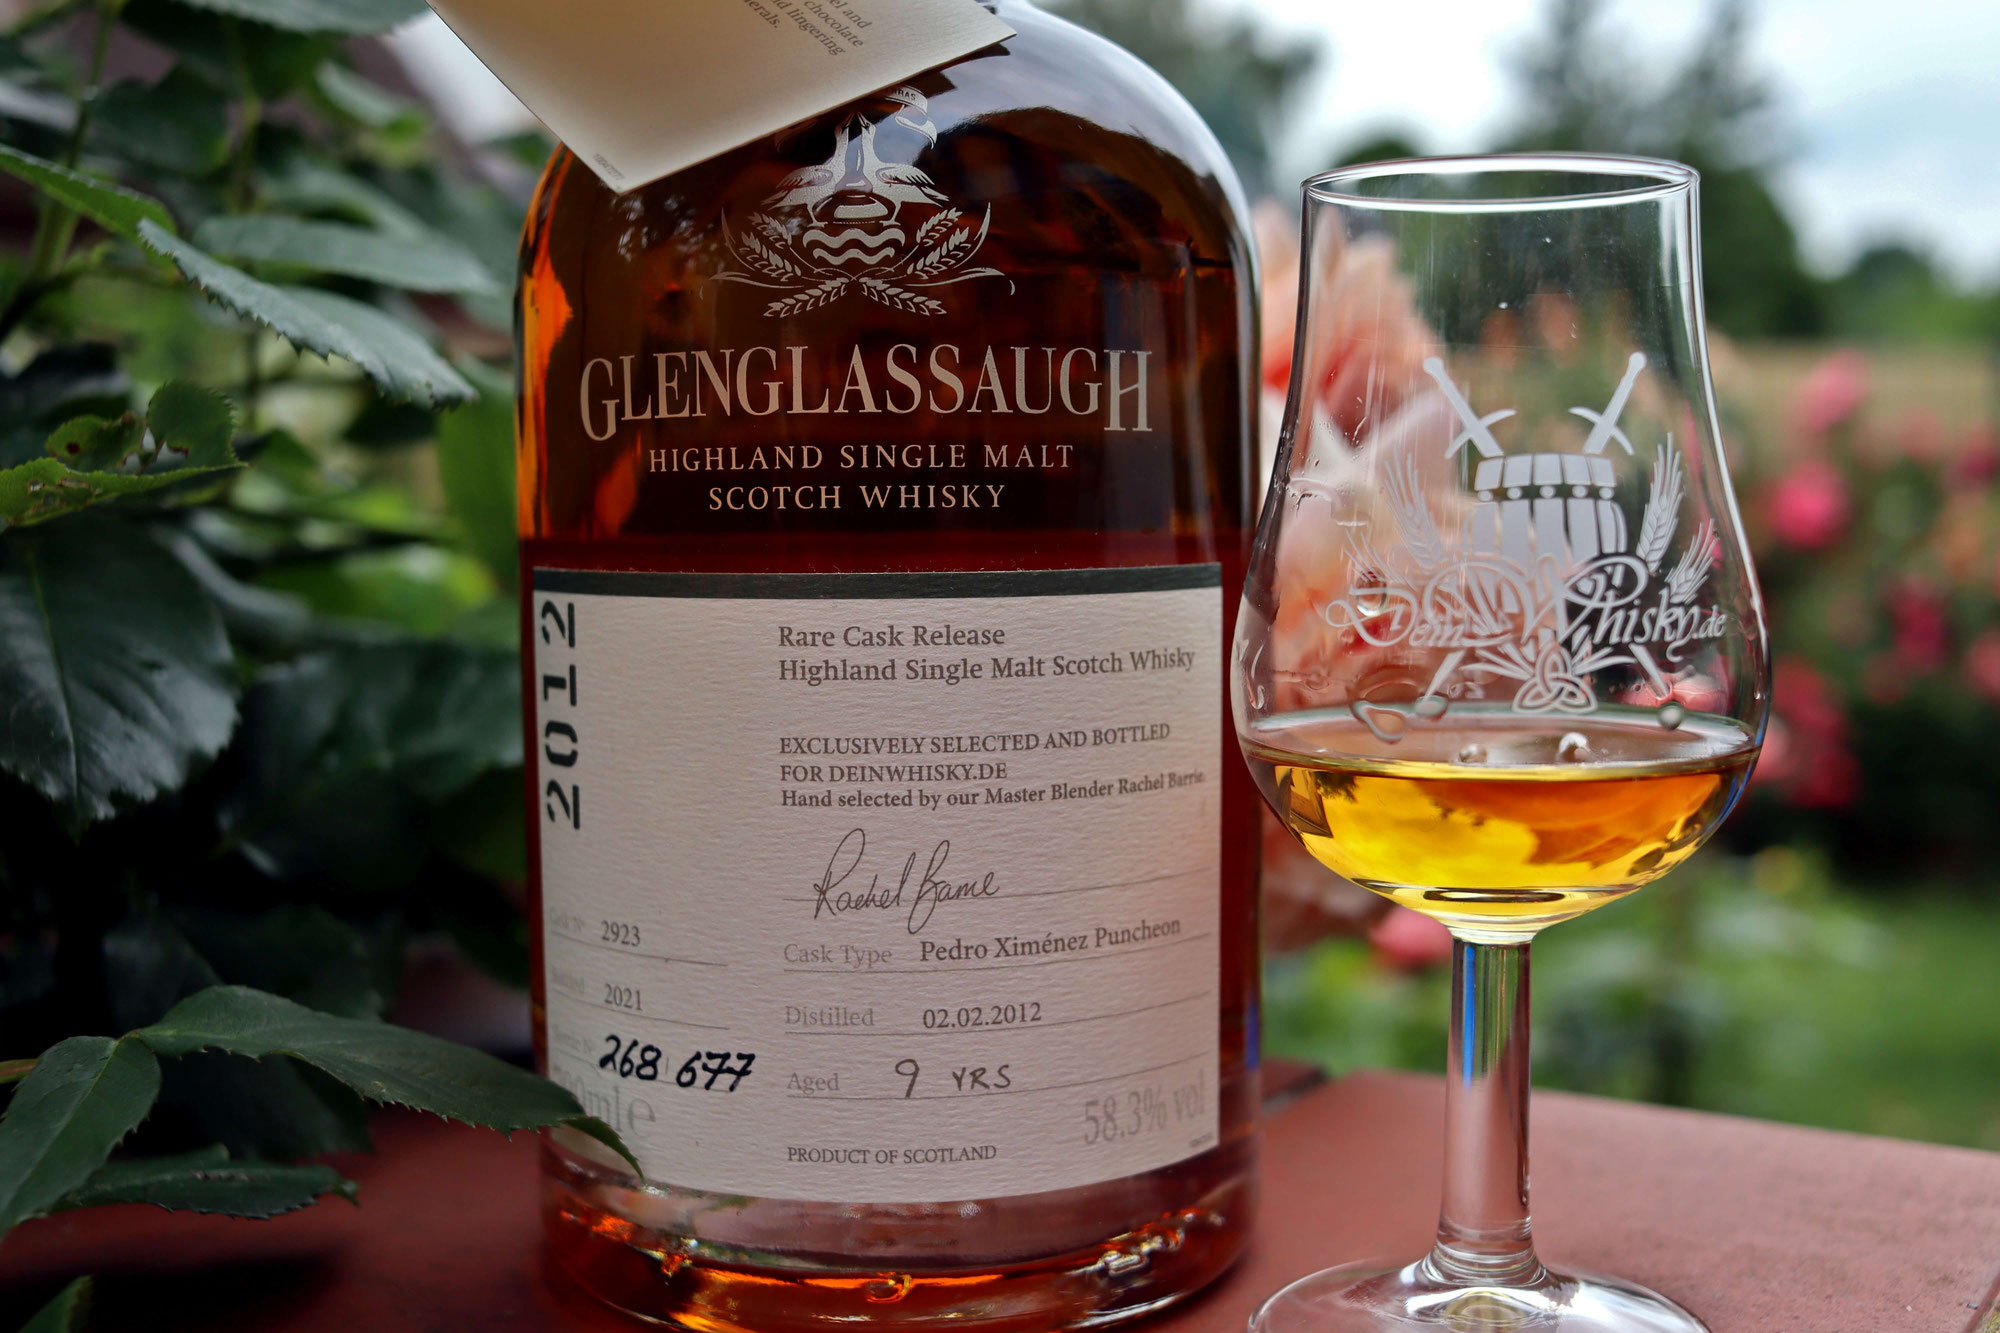 Whiskybesprechung #205: Glenglassaugh 2012/2021 für deinwhisky.de